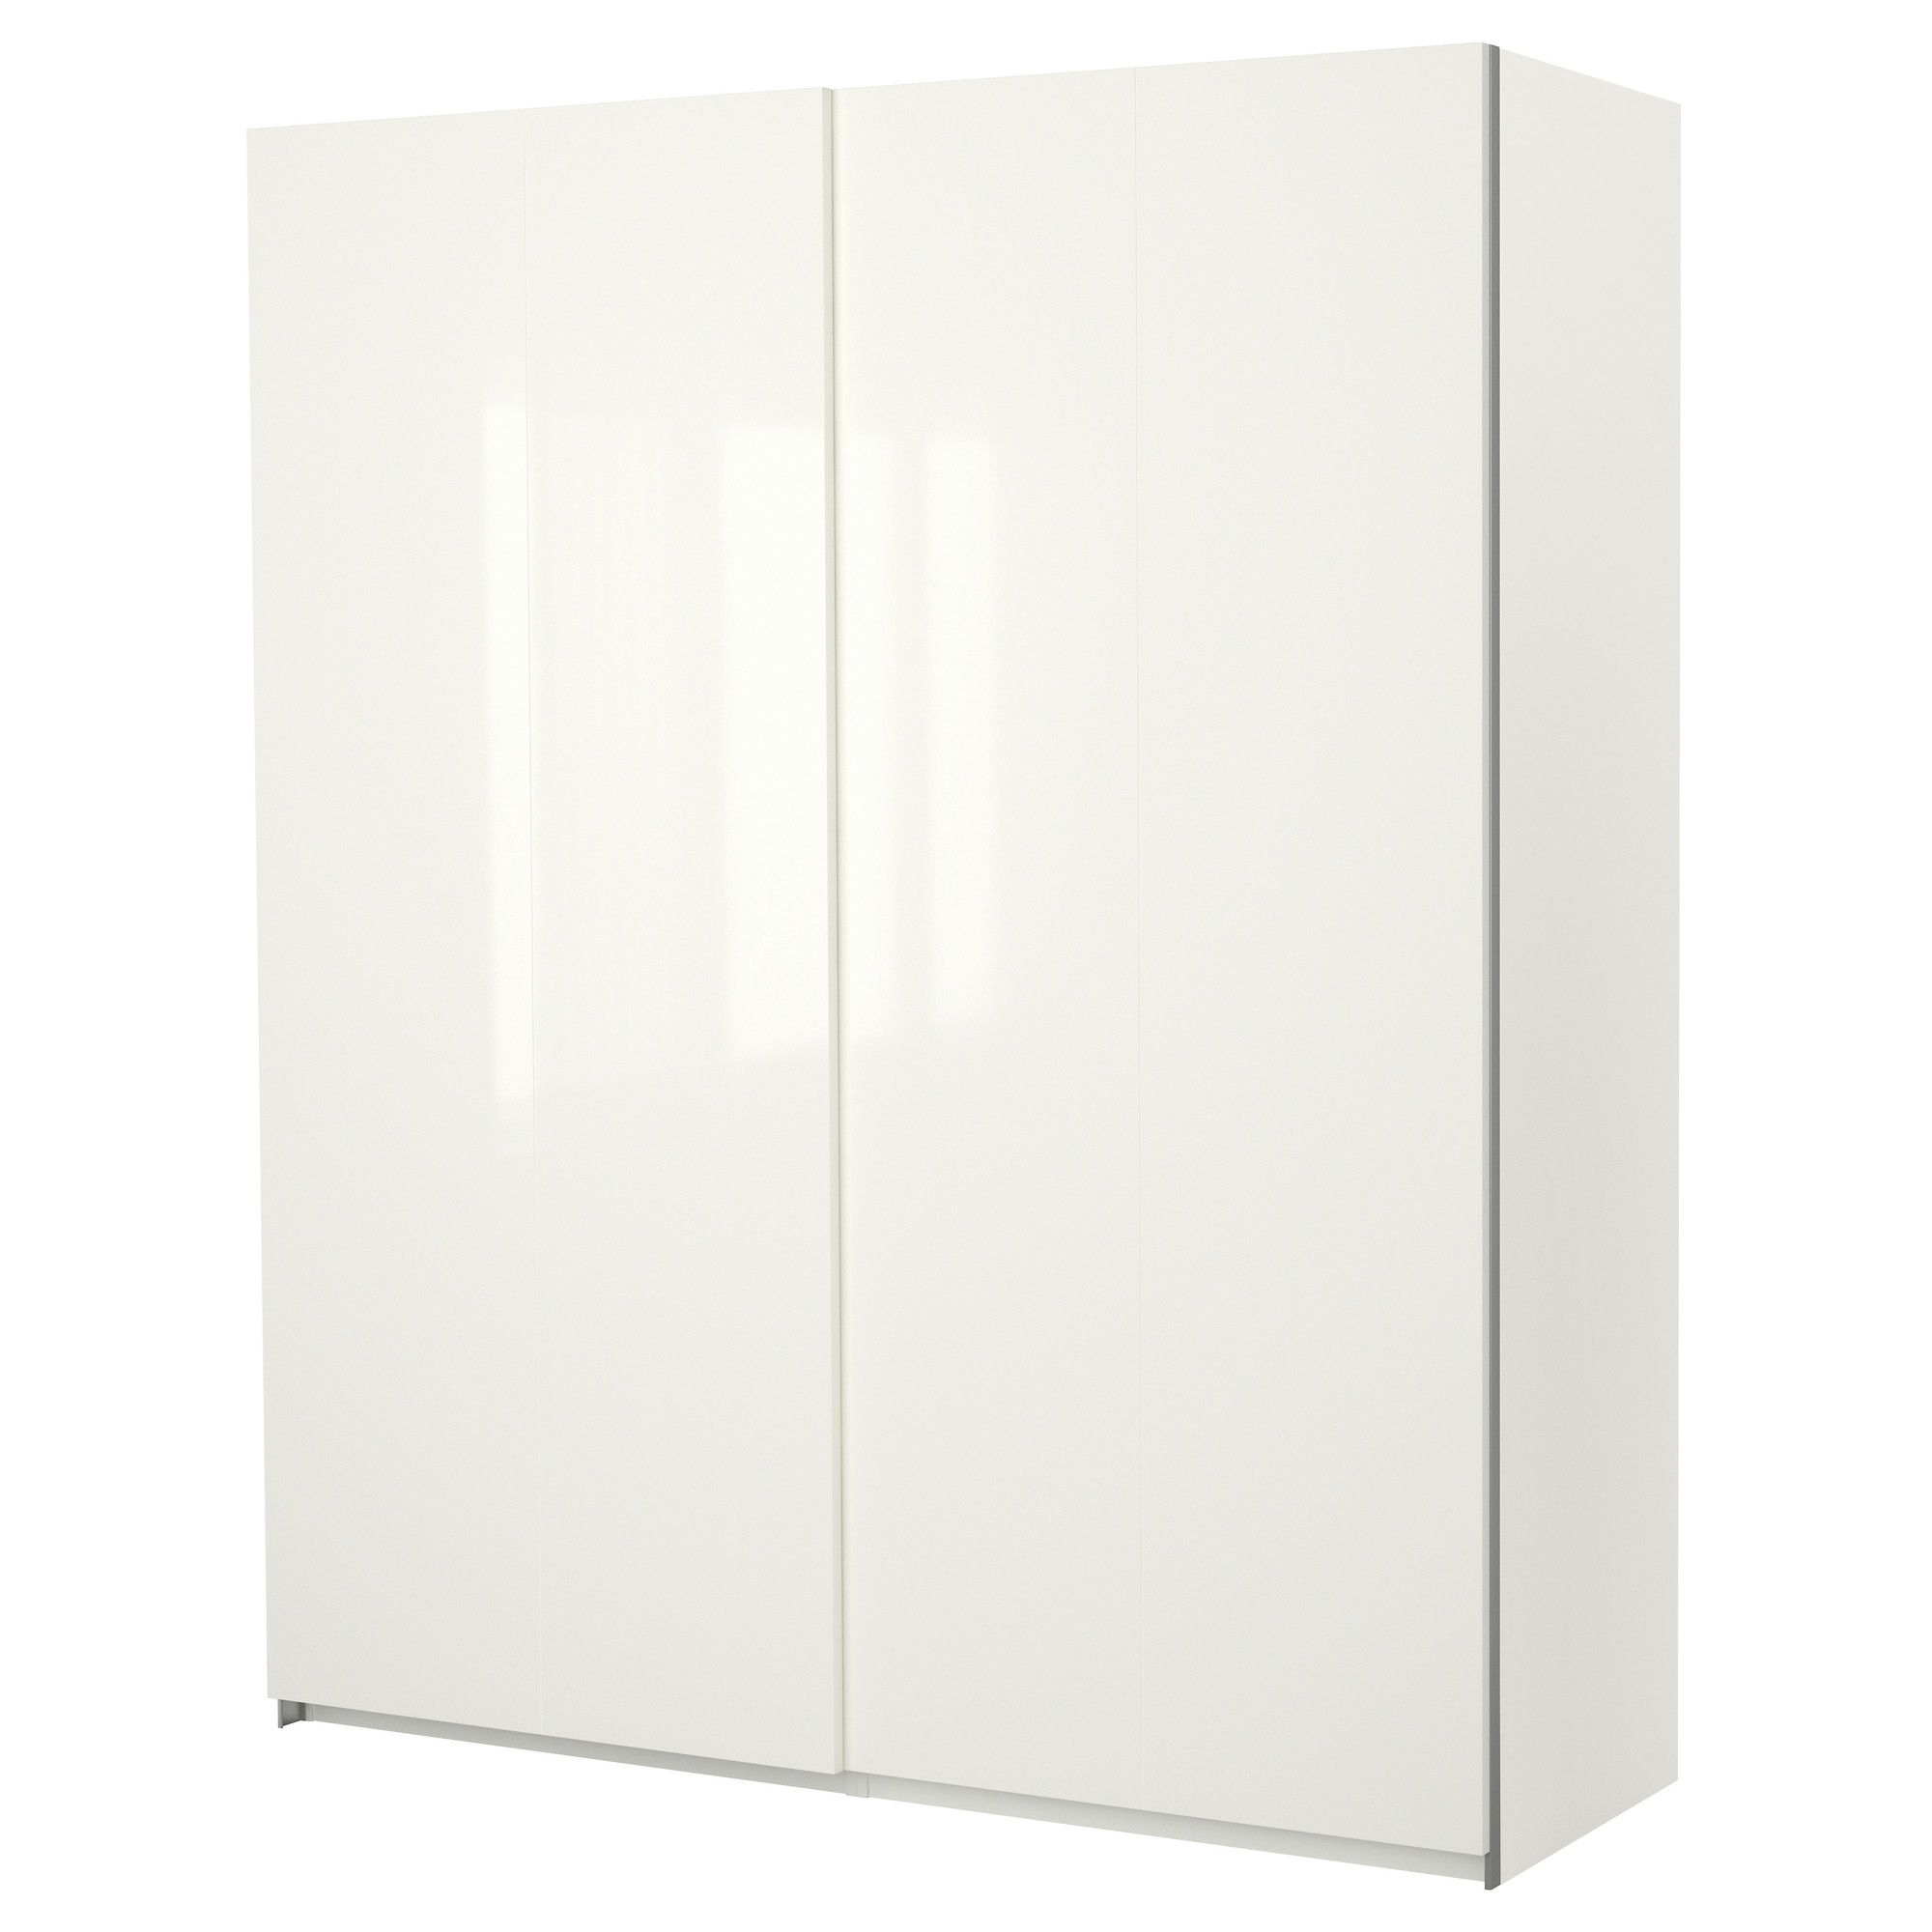 Pax wardrobe with sliding doors white hasvik high gloss for Ikea wardrobe